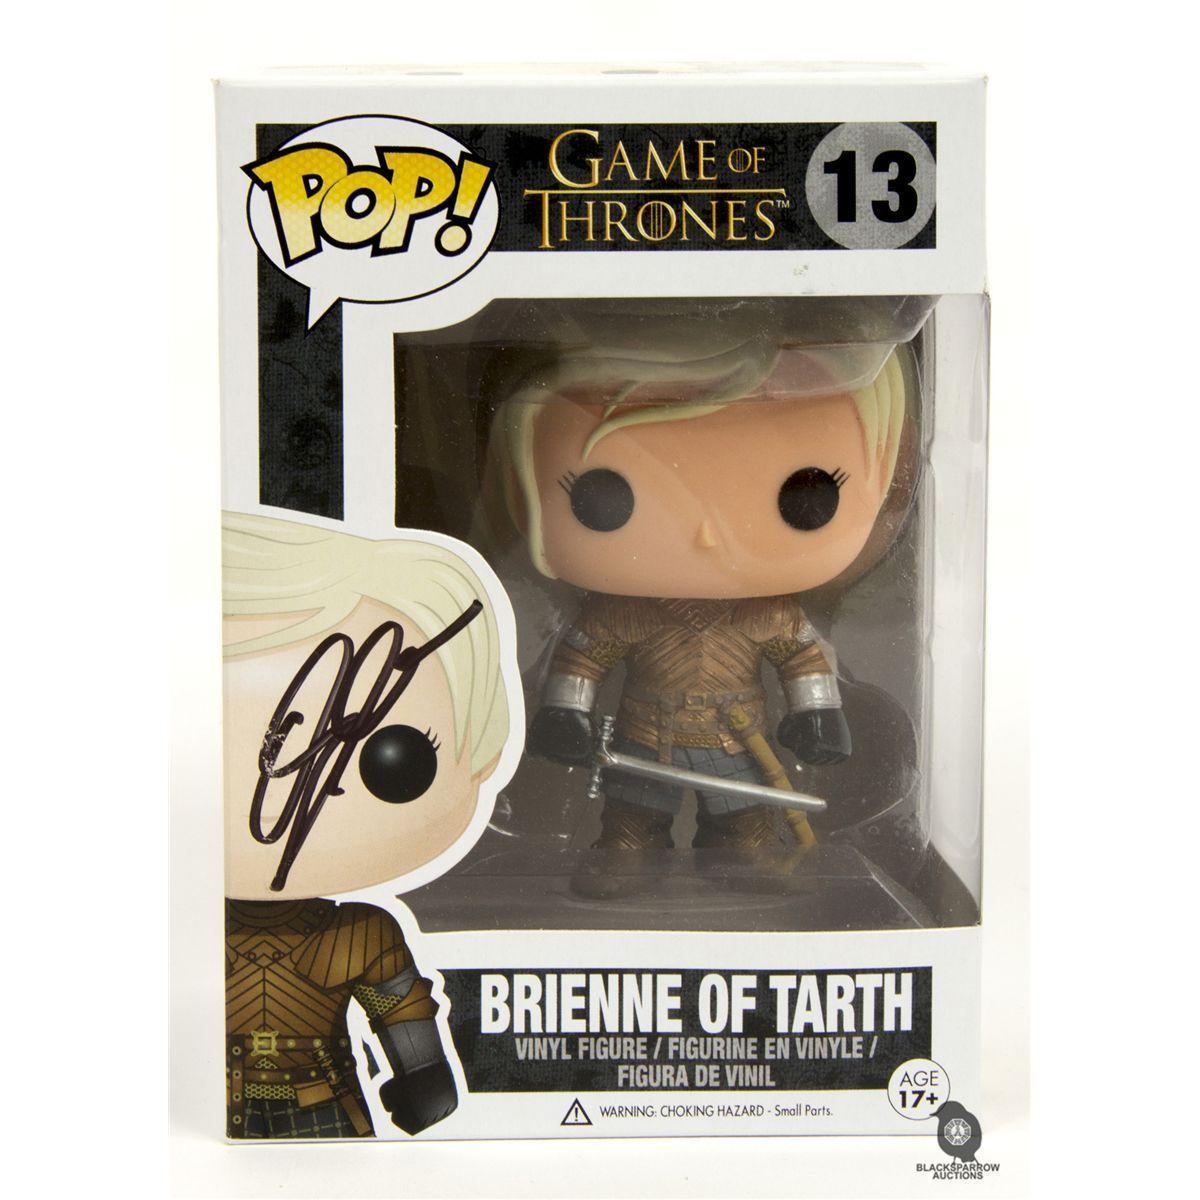 Game of Thrones Vinyl Figure NEW Funko Brienne of Tarth Pop